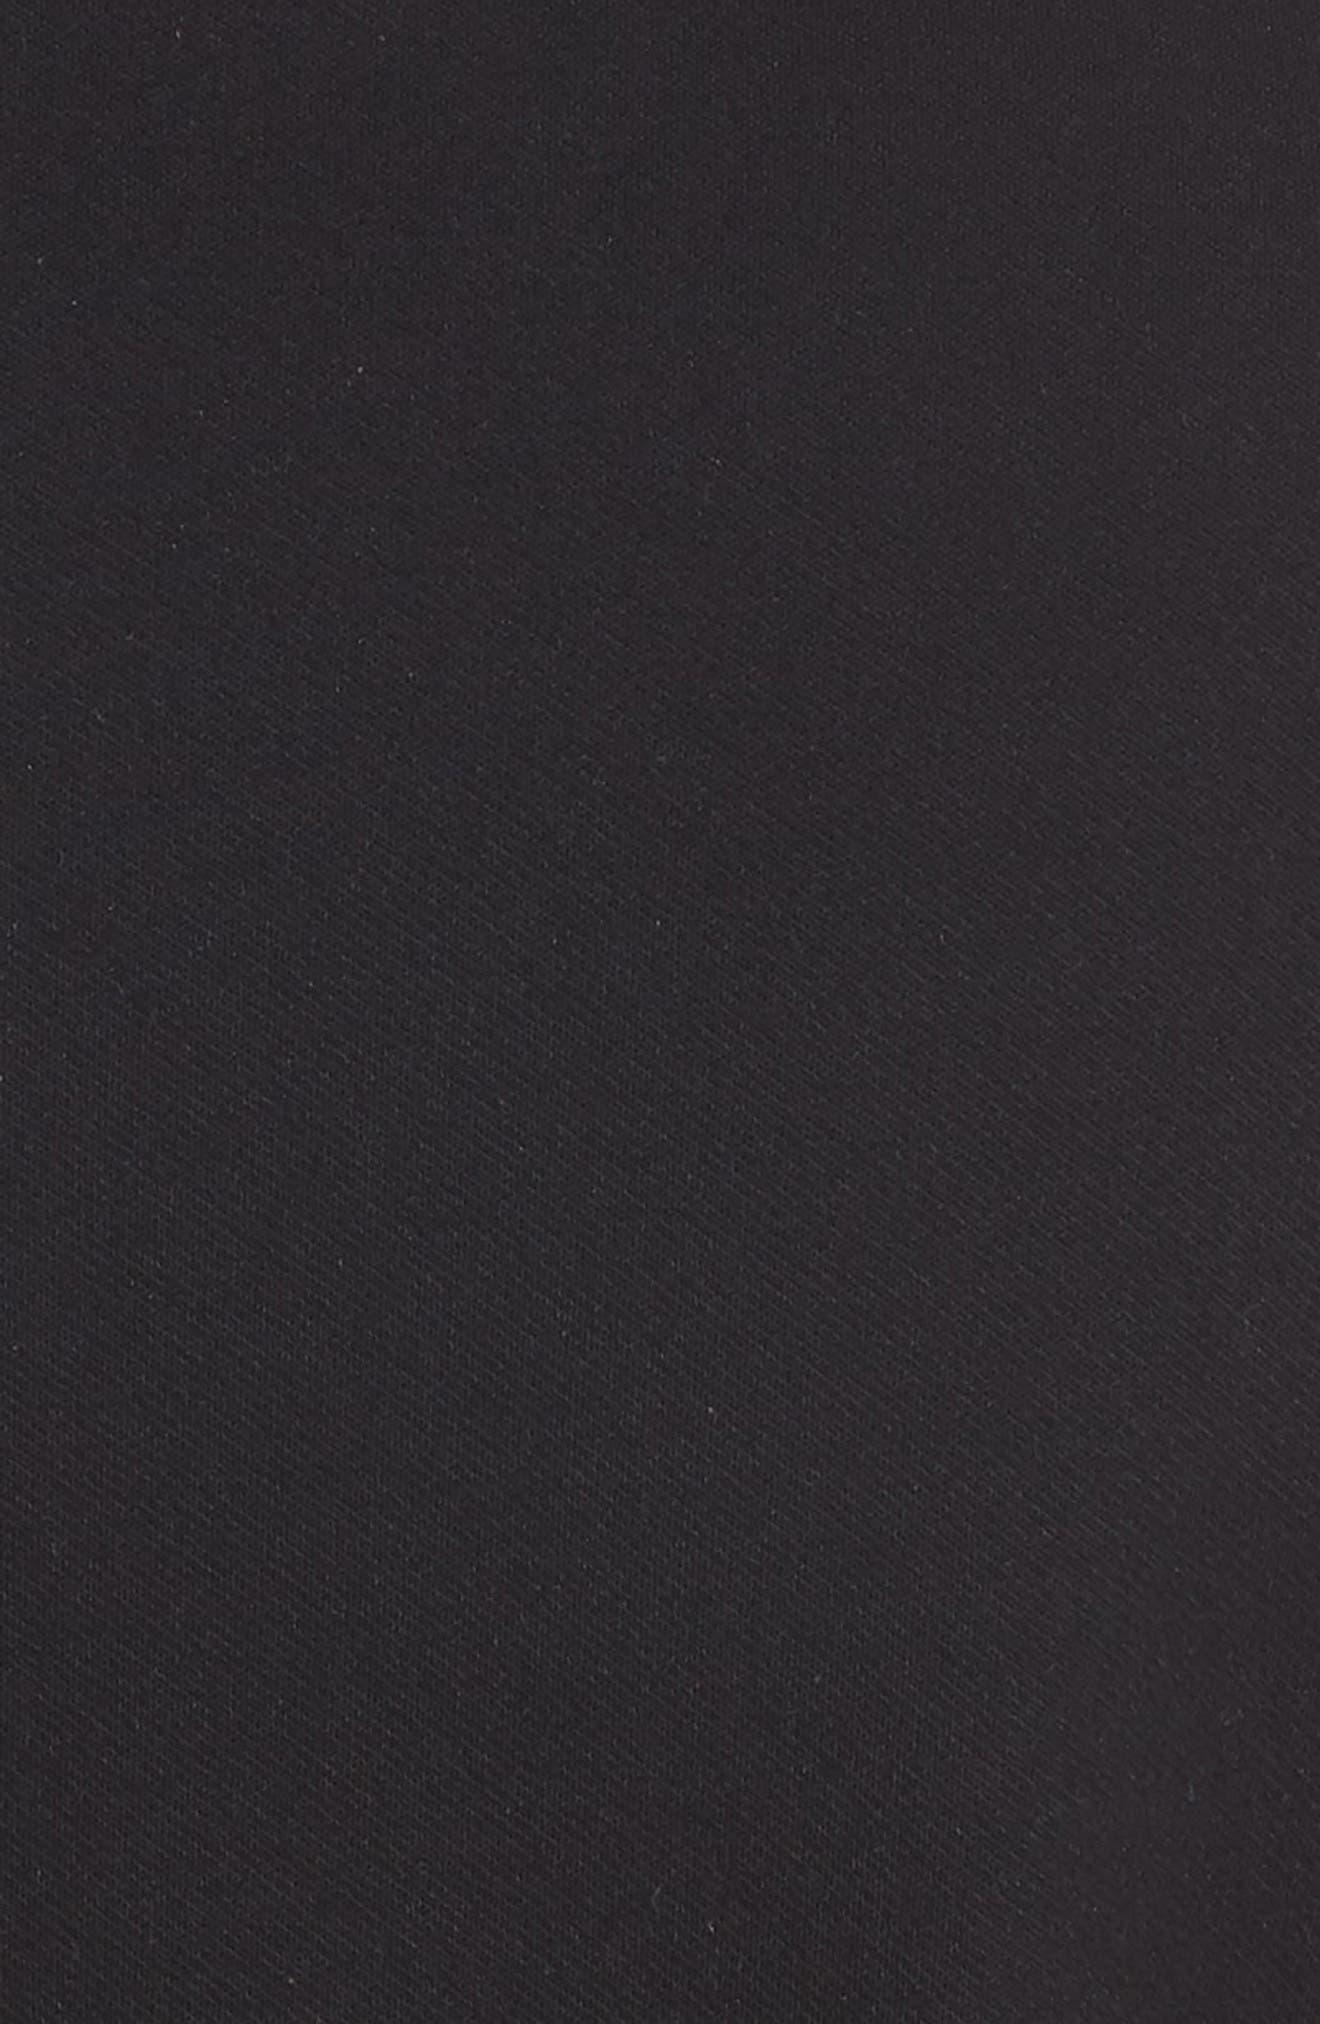 Playdate Stretch Knit Jumpsuit,                             Alternate thumbnail 7, color,                             Black